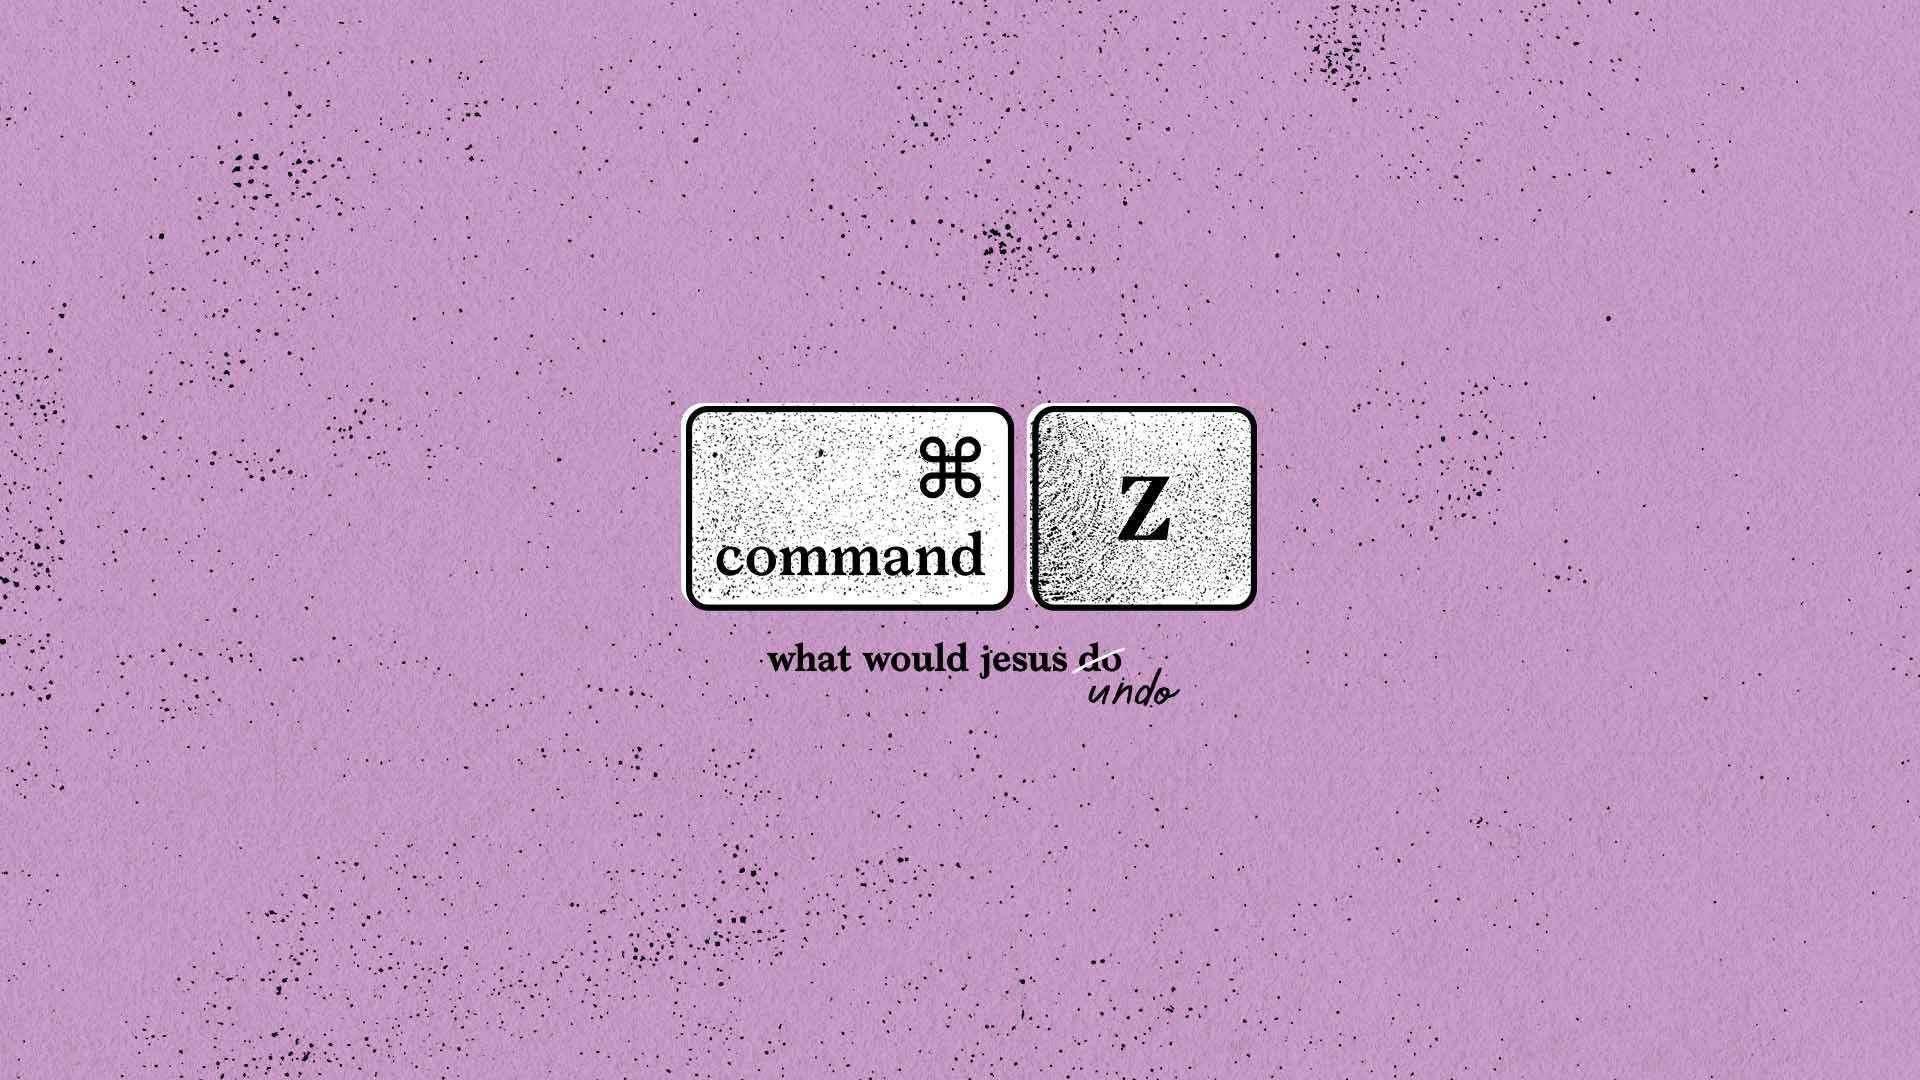 Command Z